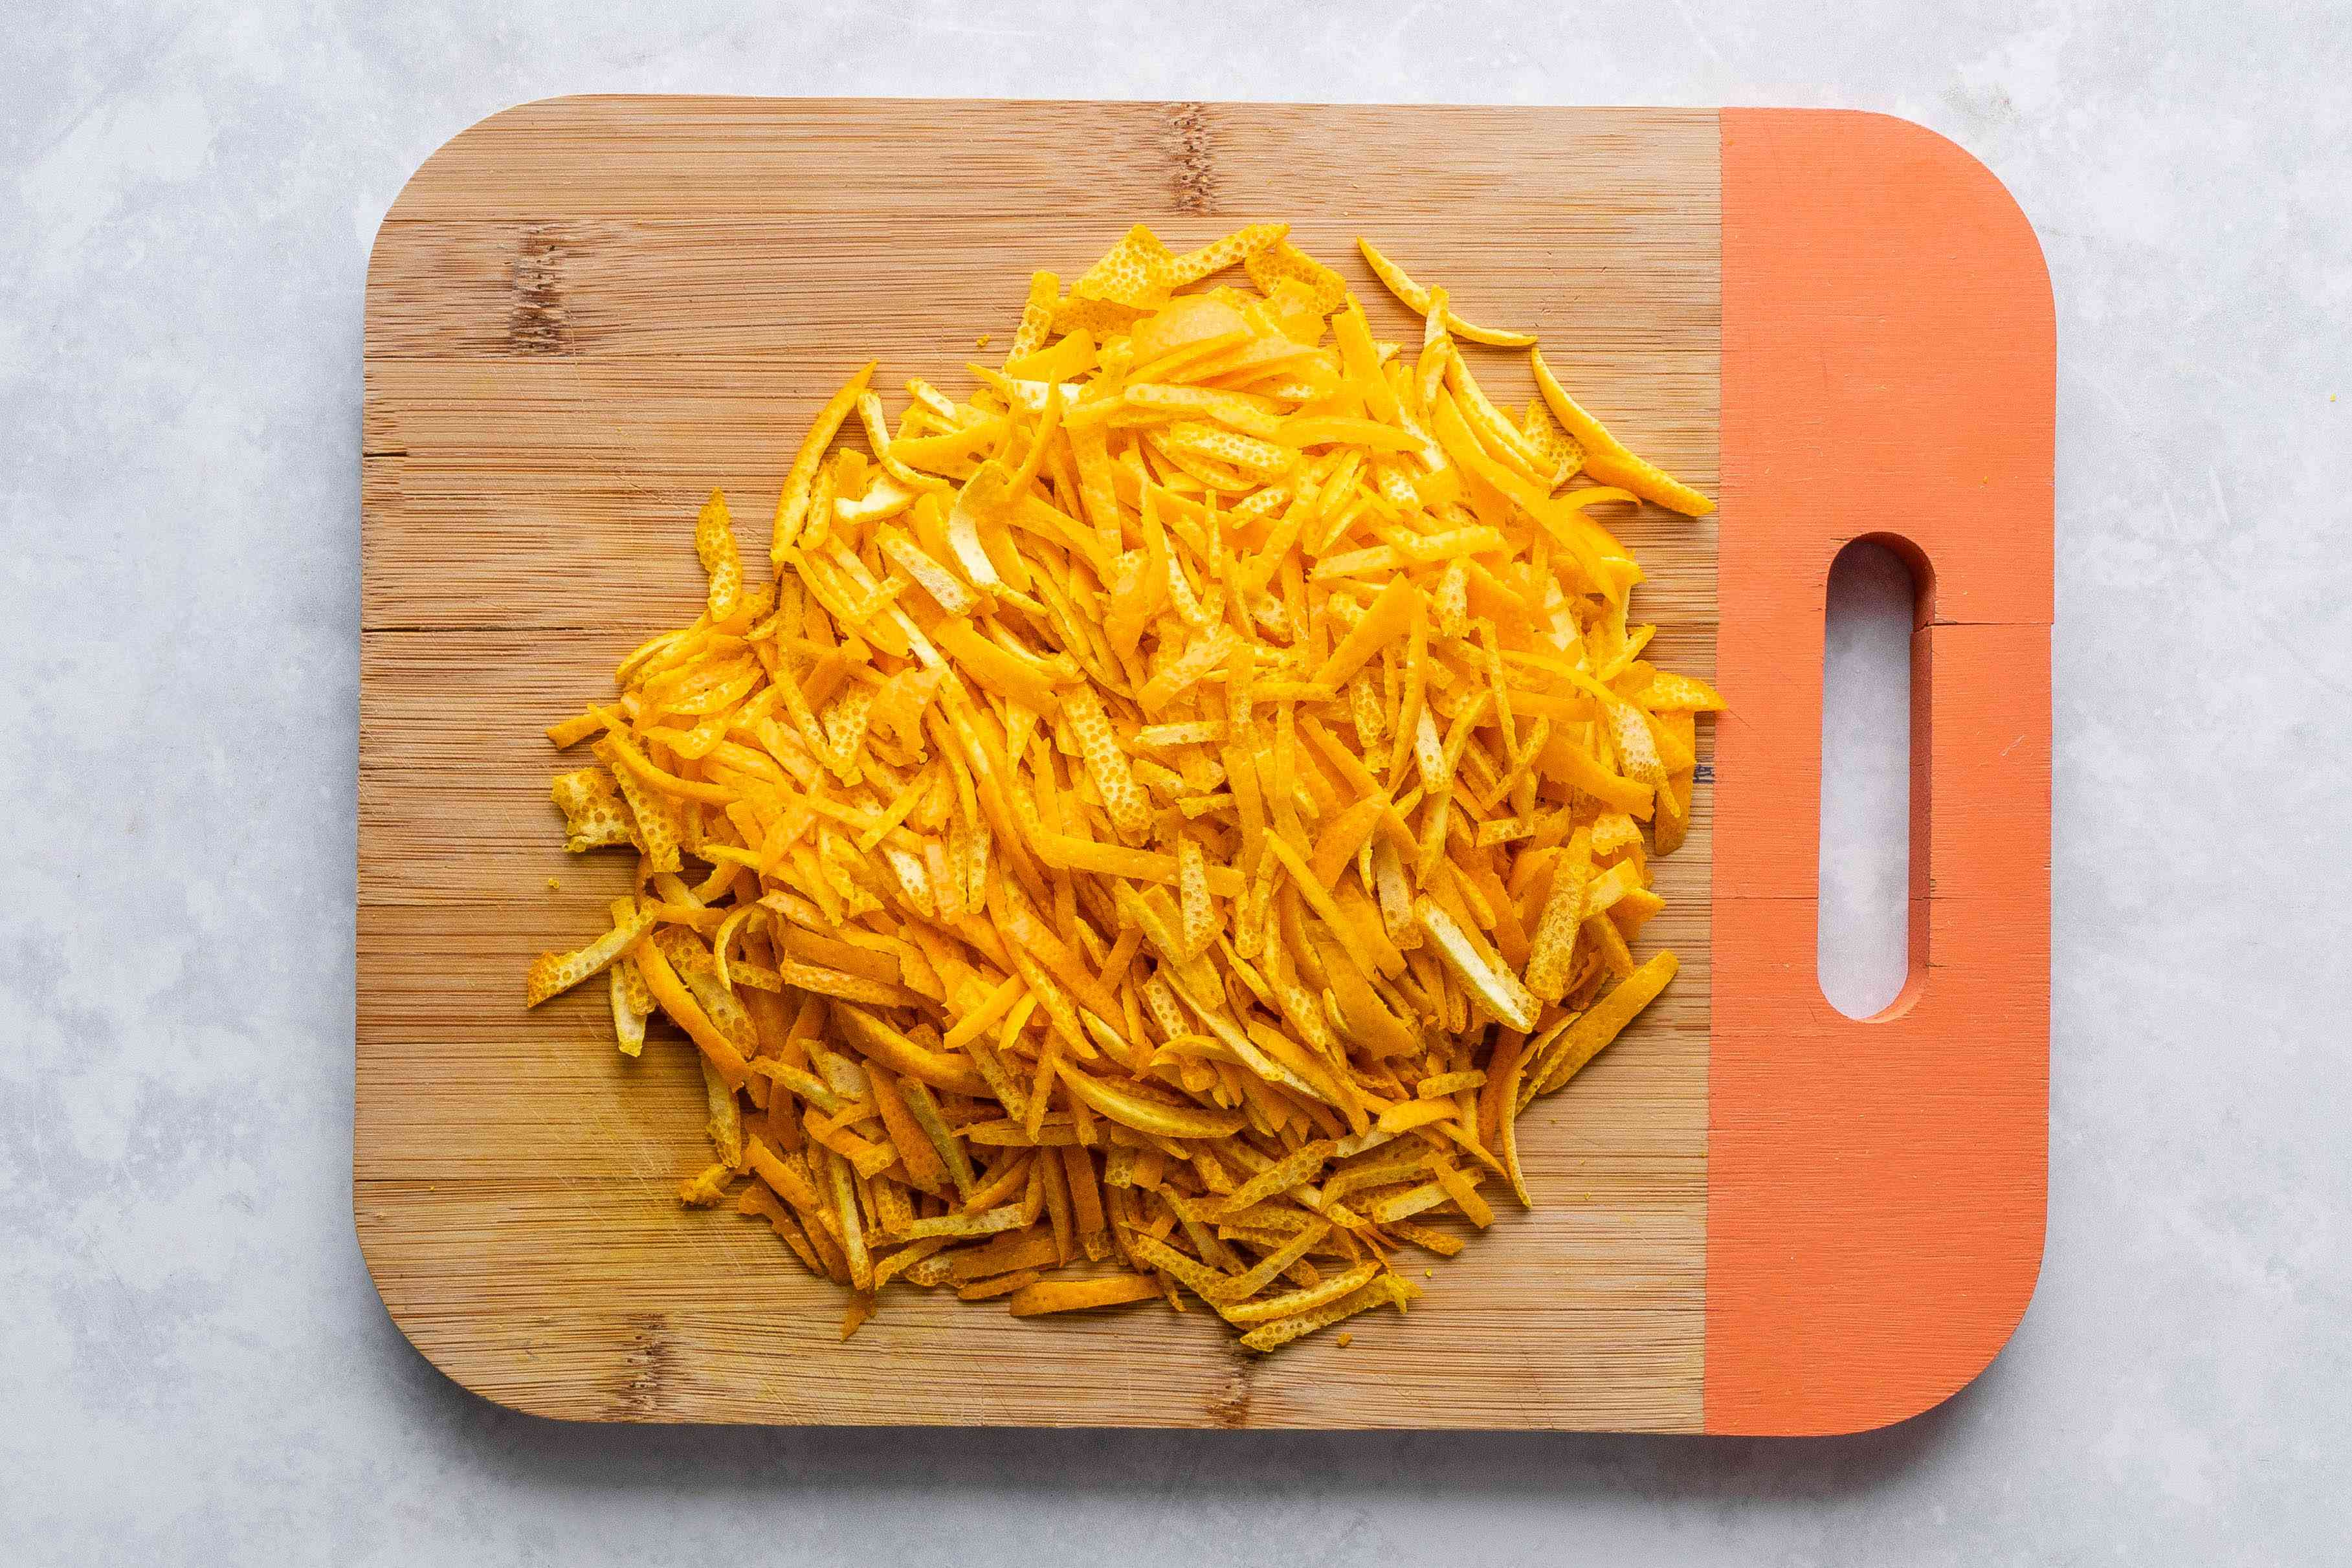 orange zest chopped into ribbon-like strips, on a wood cutting board